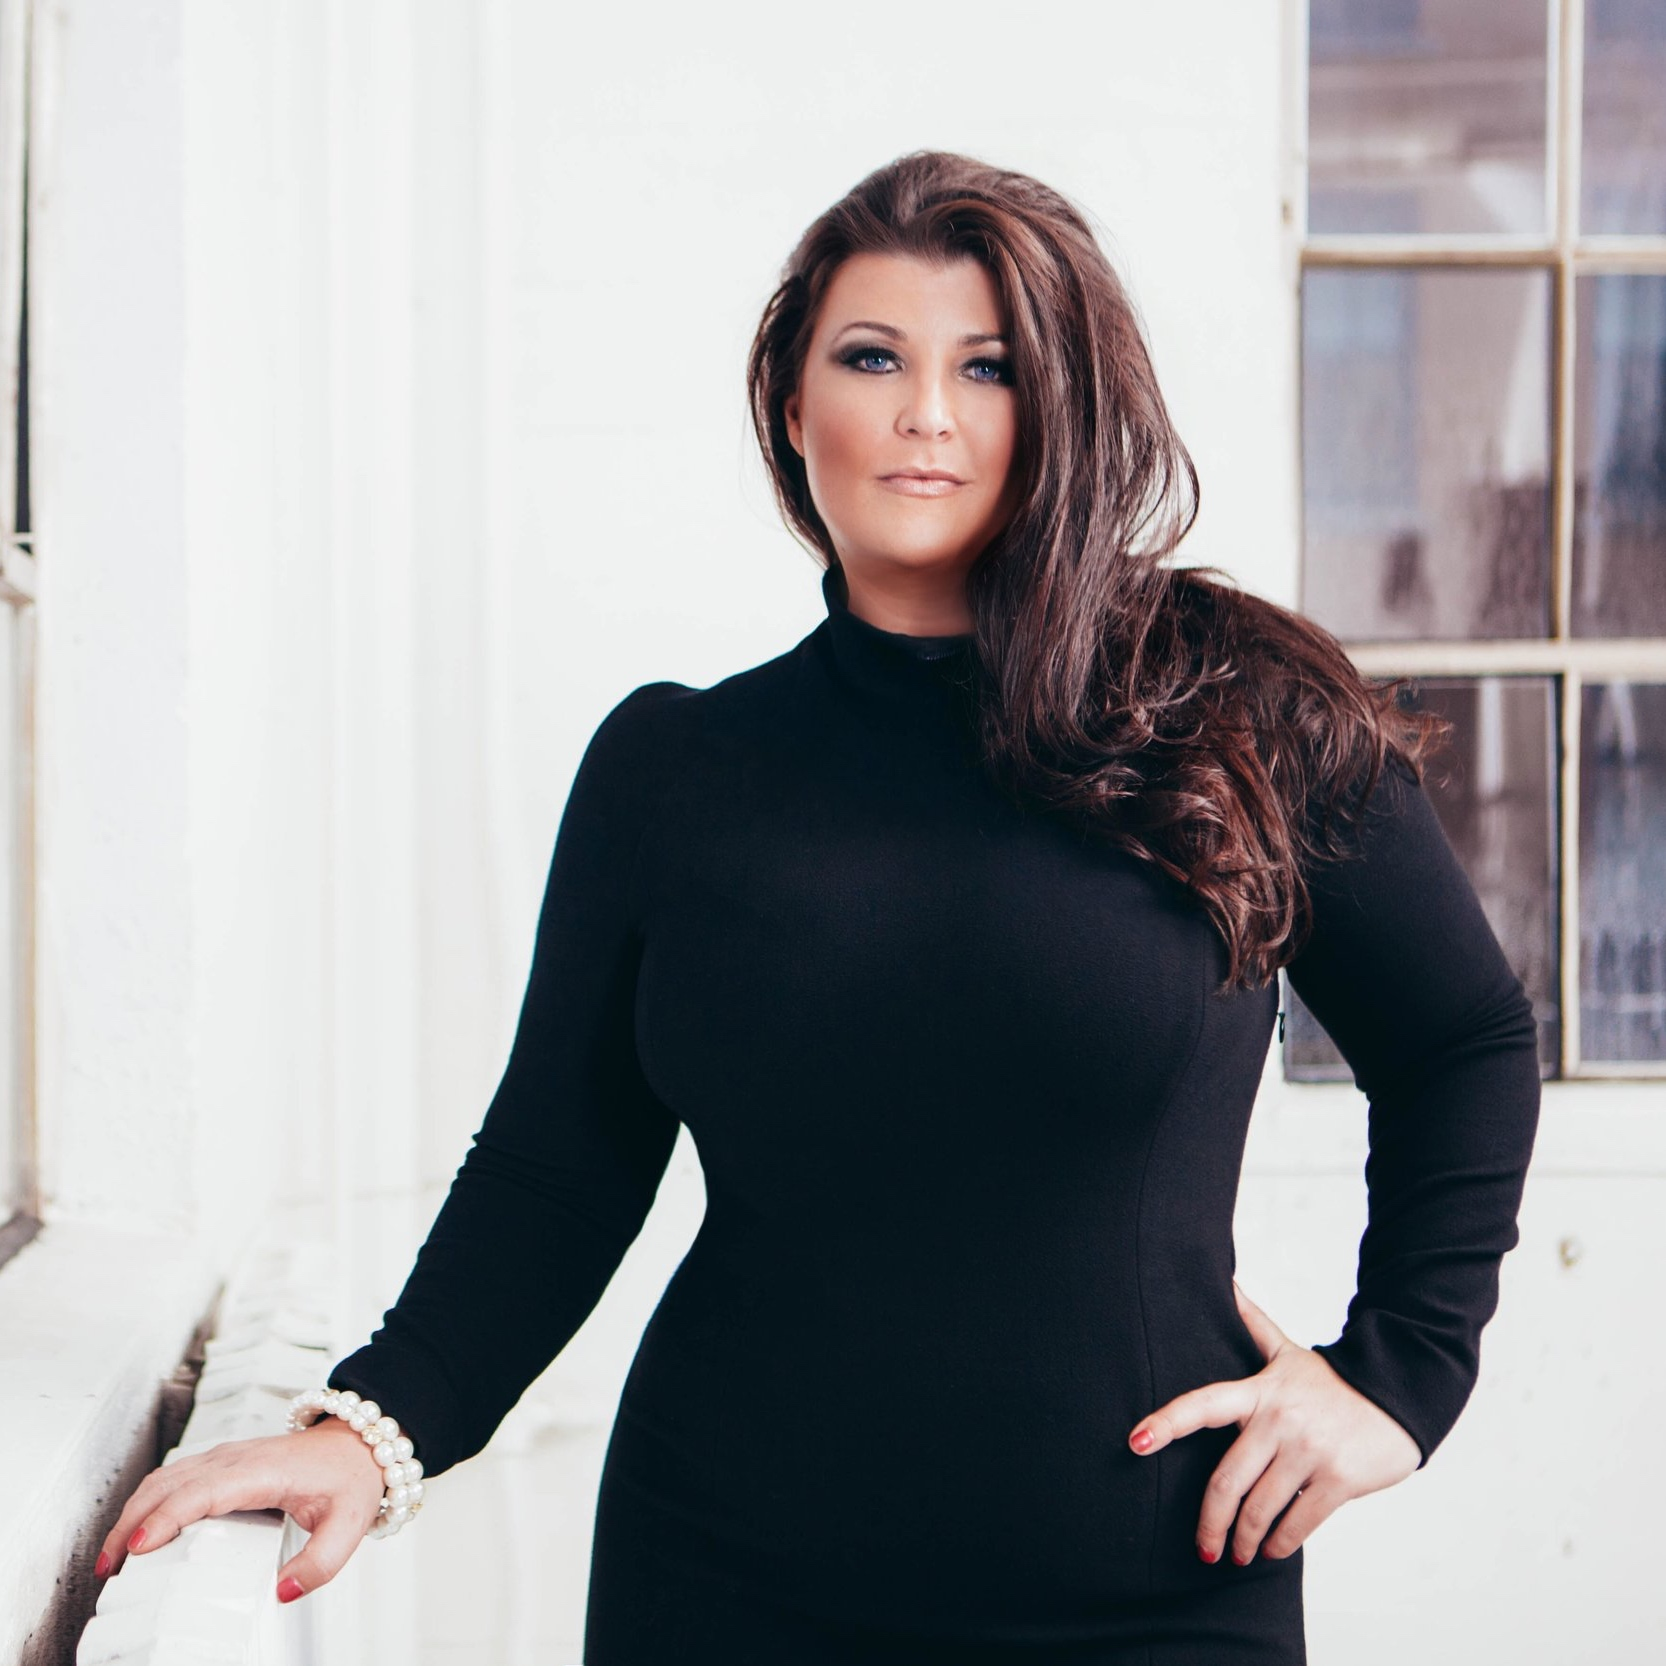 Sarah Centrella - #1 BEST-SELLING AUTHOR & MANIFESTATION EXPERT